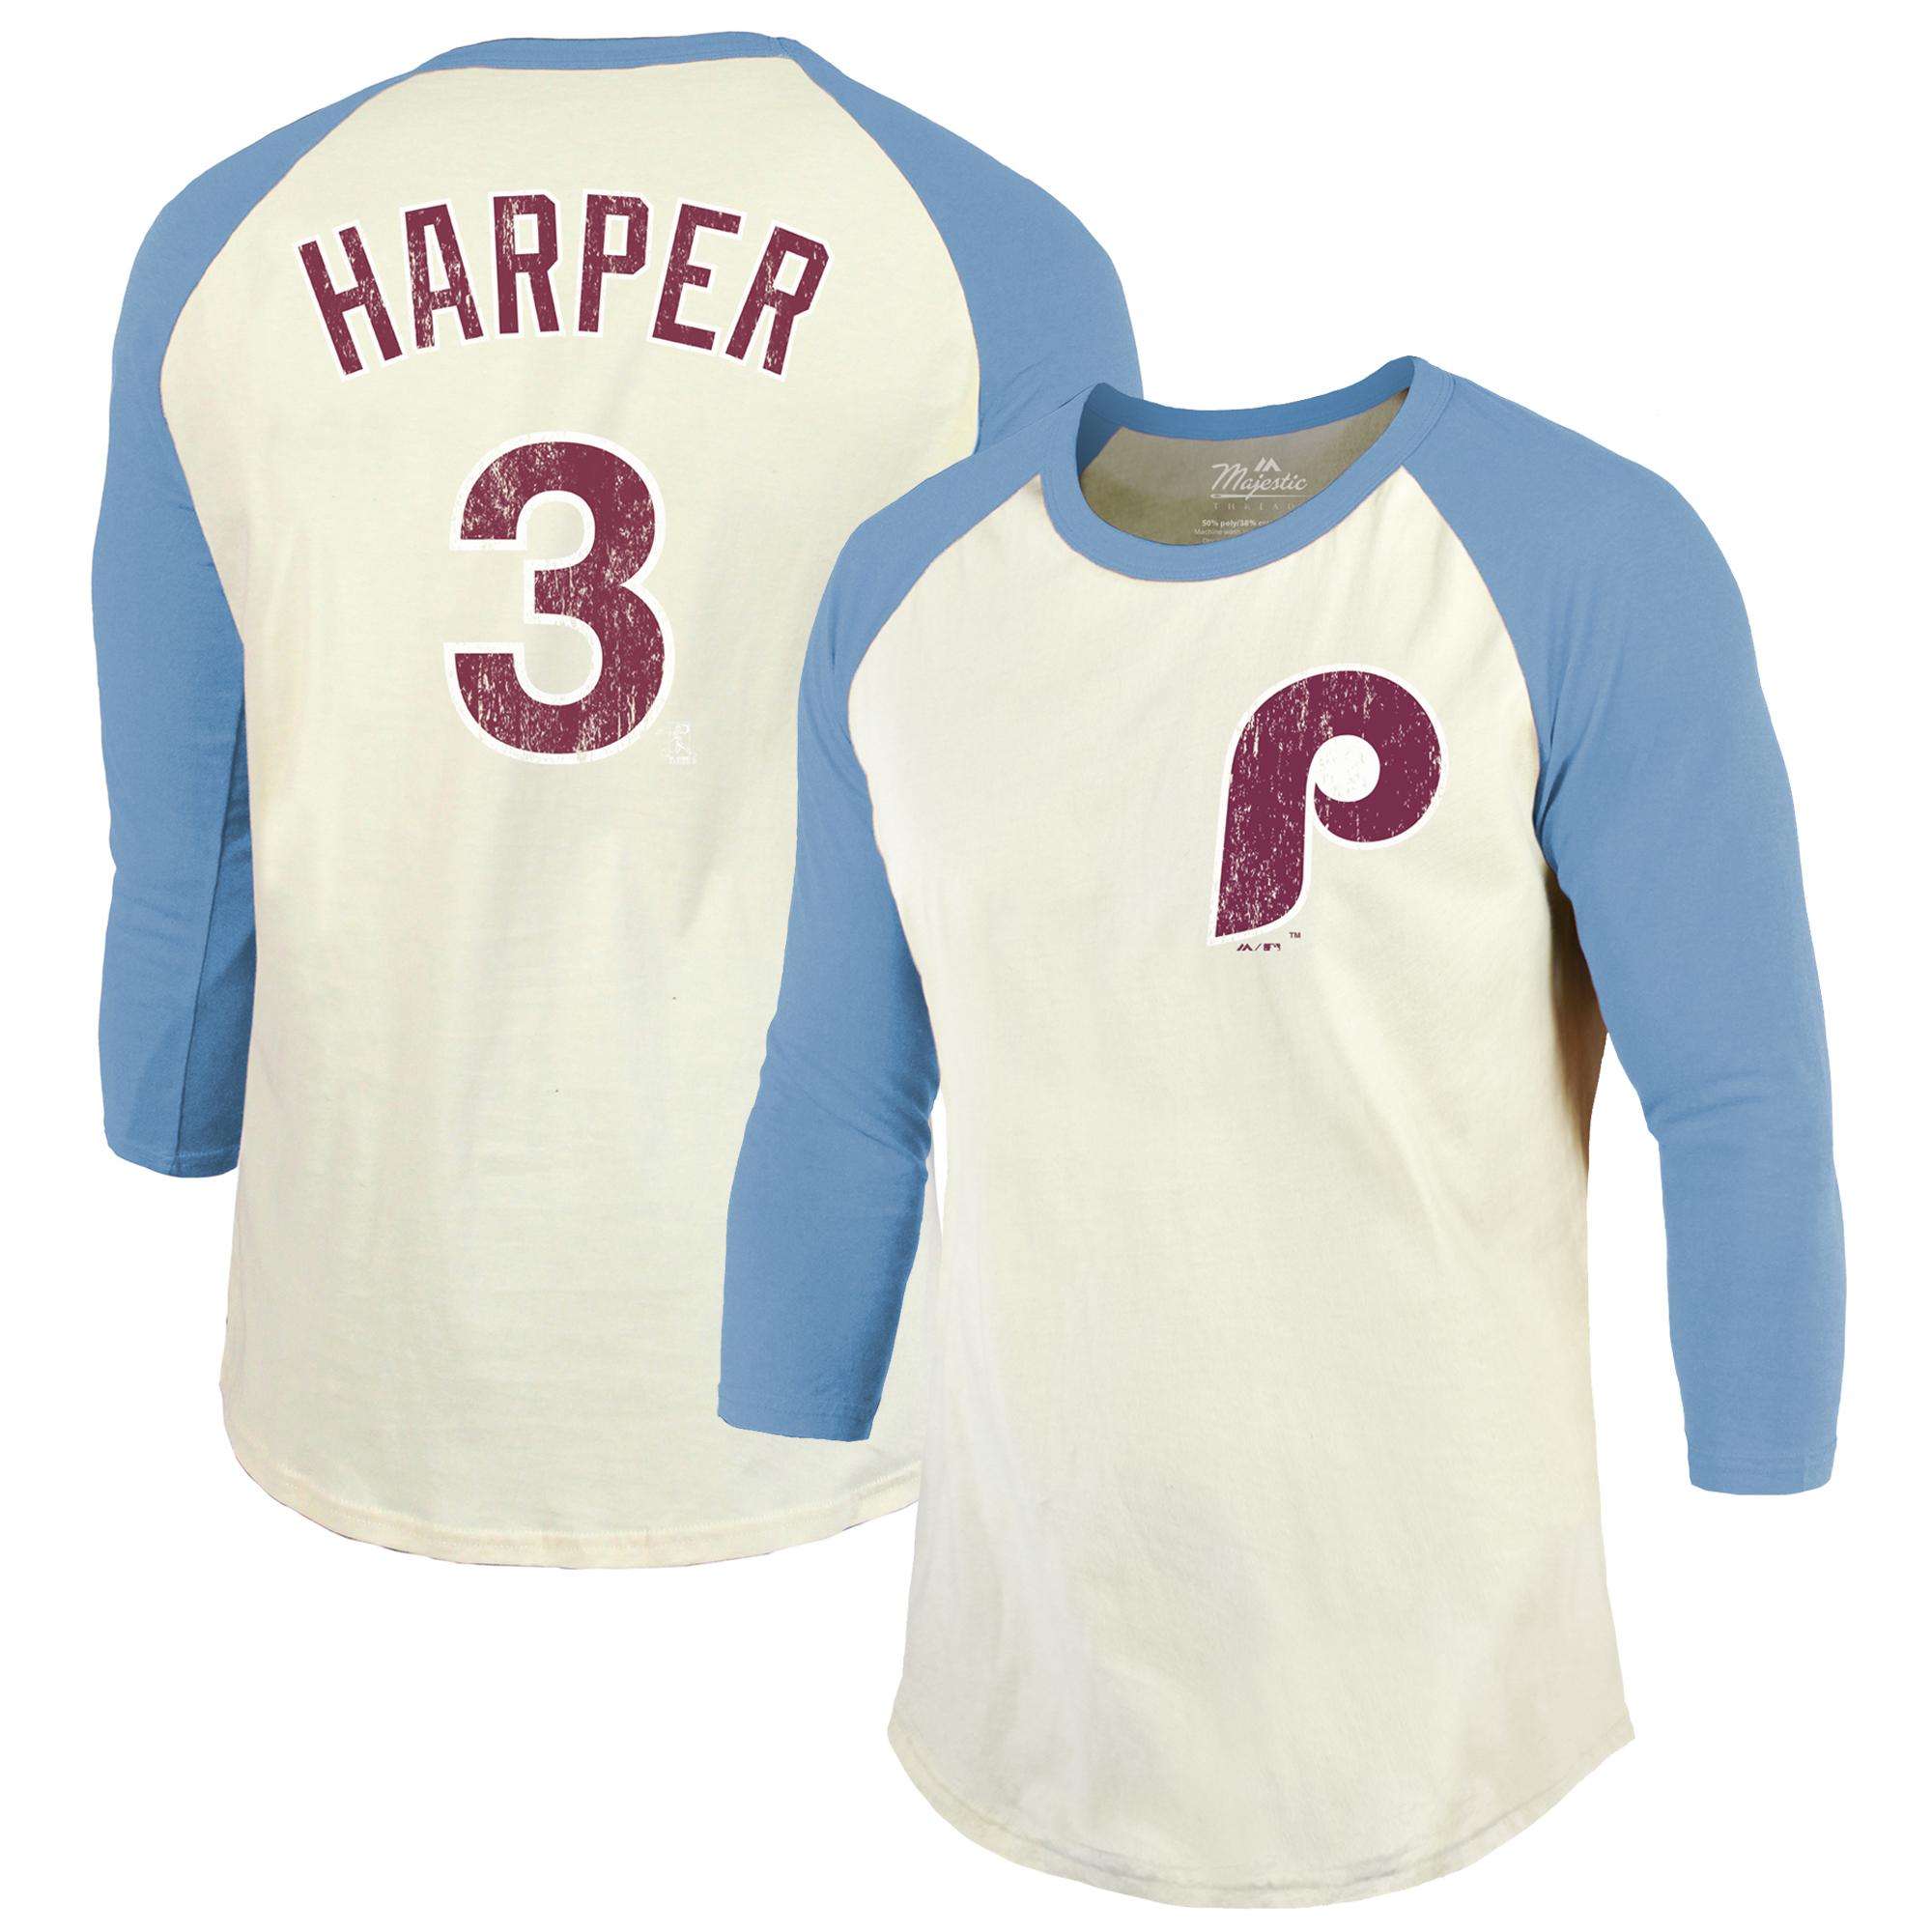 Bryce Harper Philadelphia Phillies Majestic Threads Softhand Name & Number Raglan 3/4 Sleeve T-Shirt - Cream